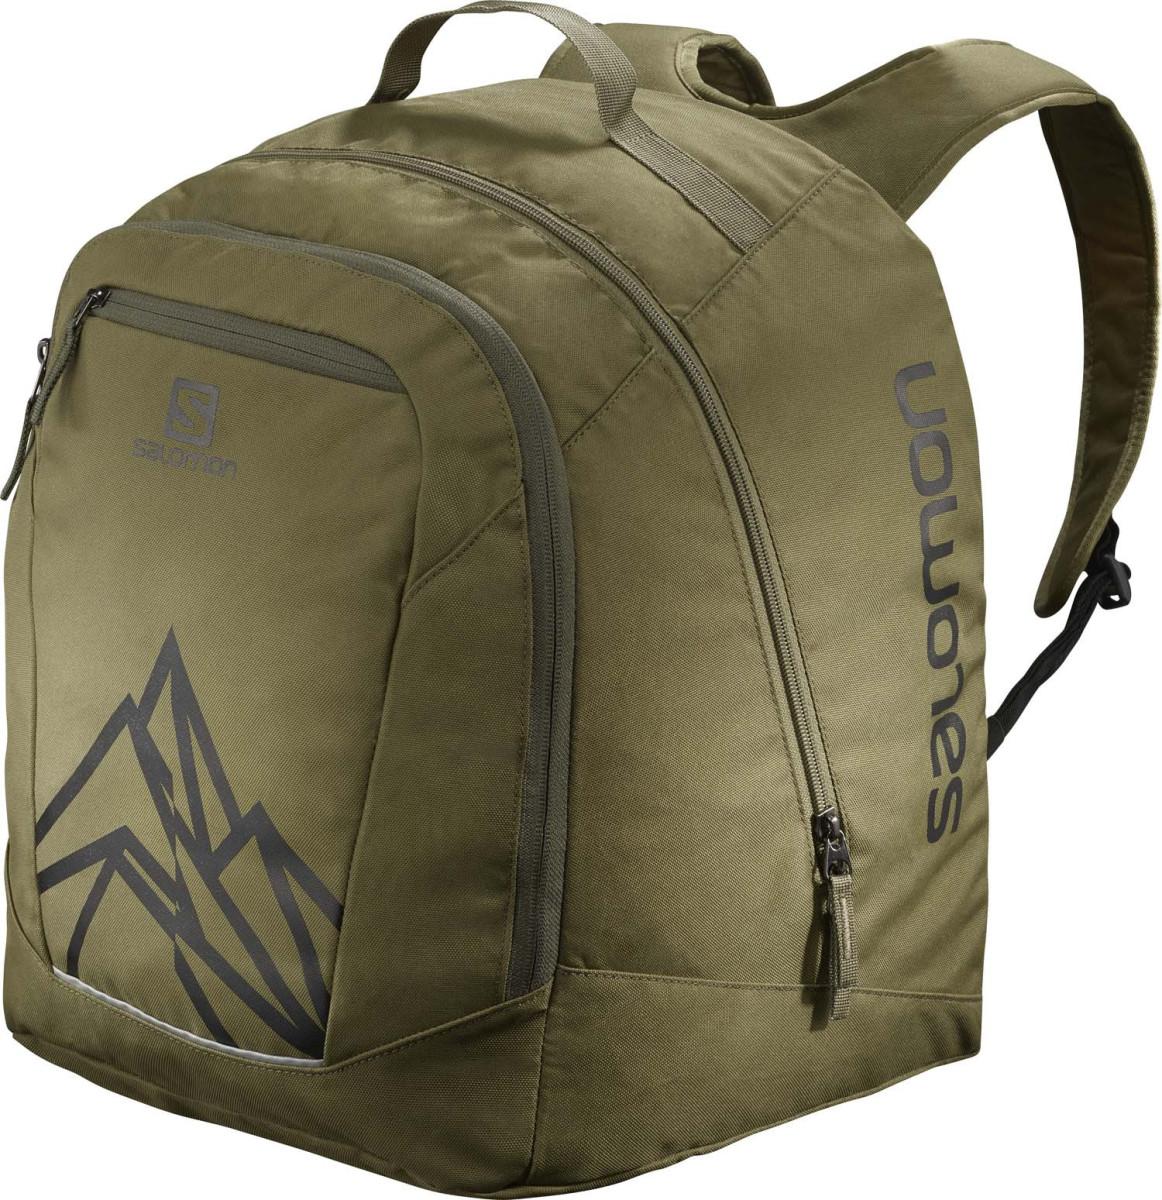 Salomon Original Gear Backpack - zelená 2020/2021.